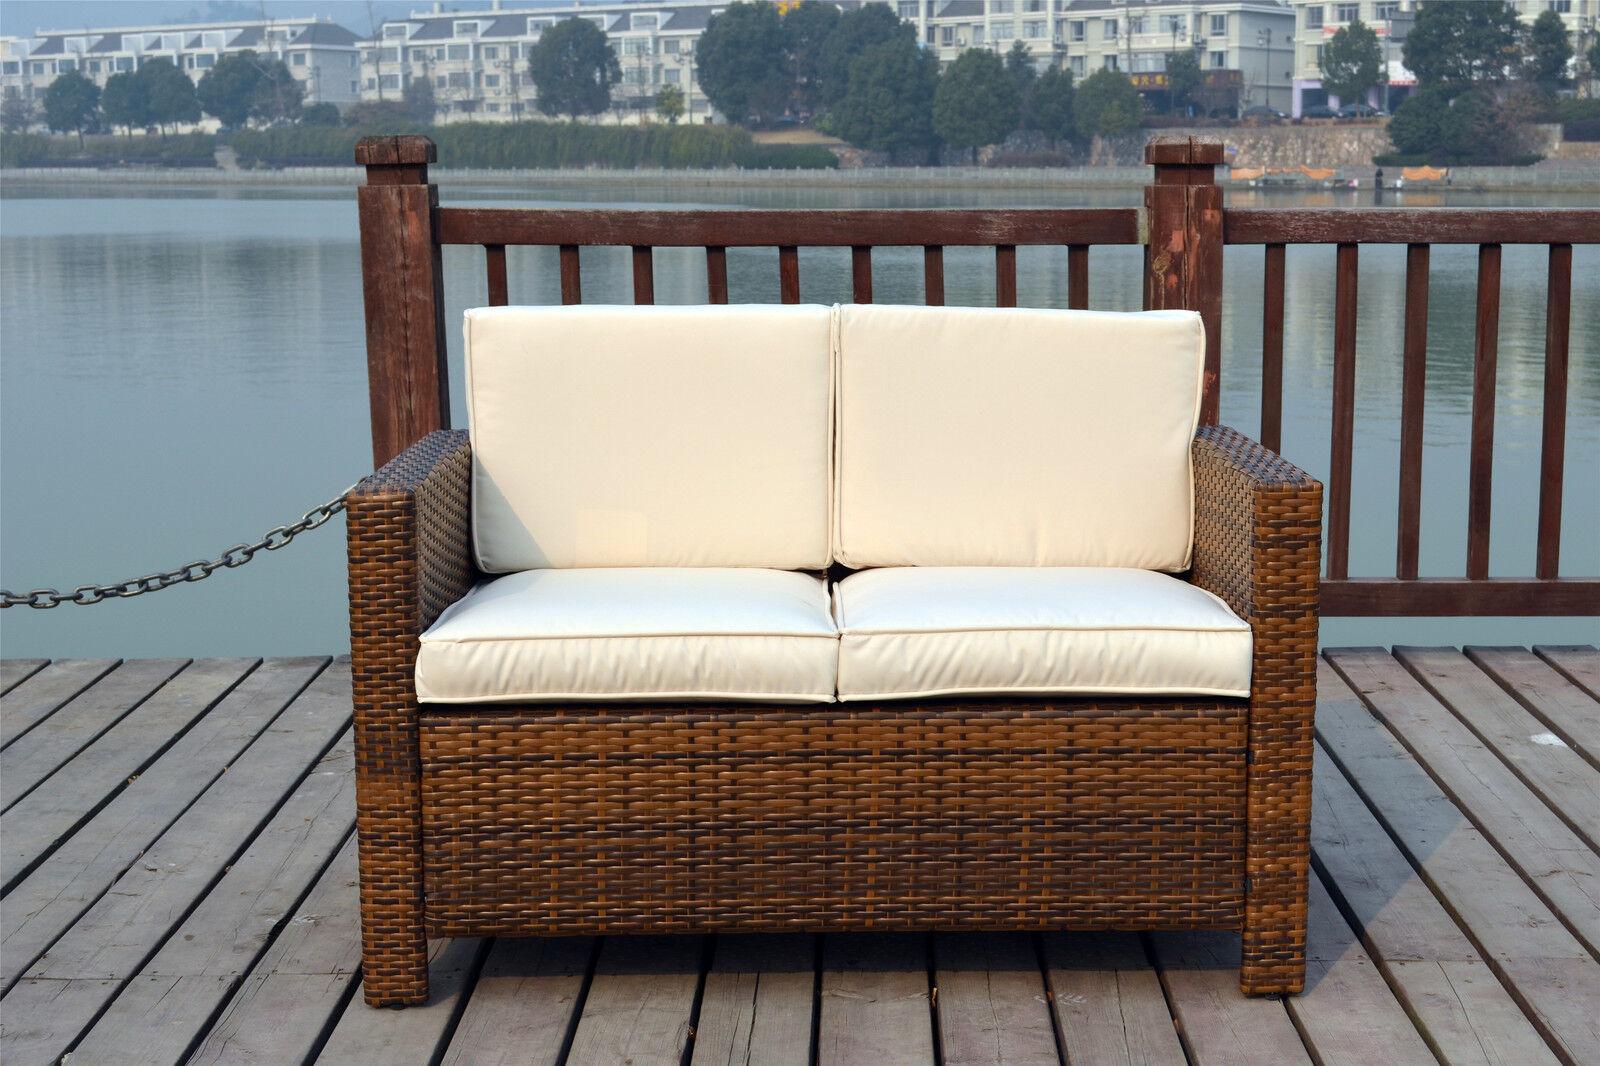 Rattan Wicker Conservatory Outdoor Garden Furniture Patio